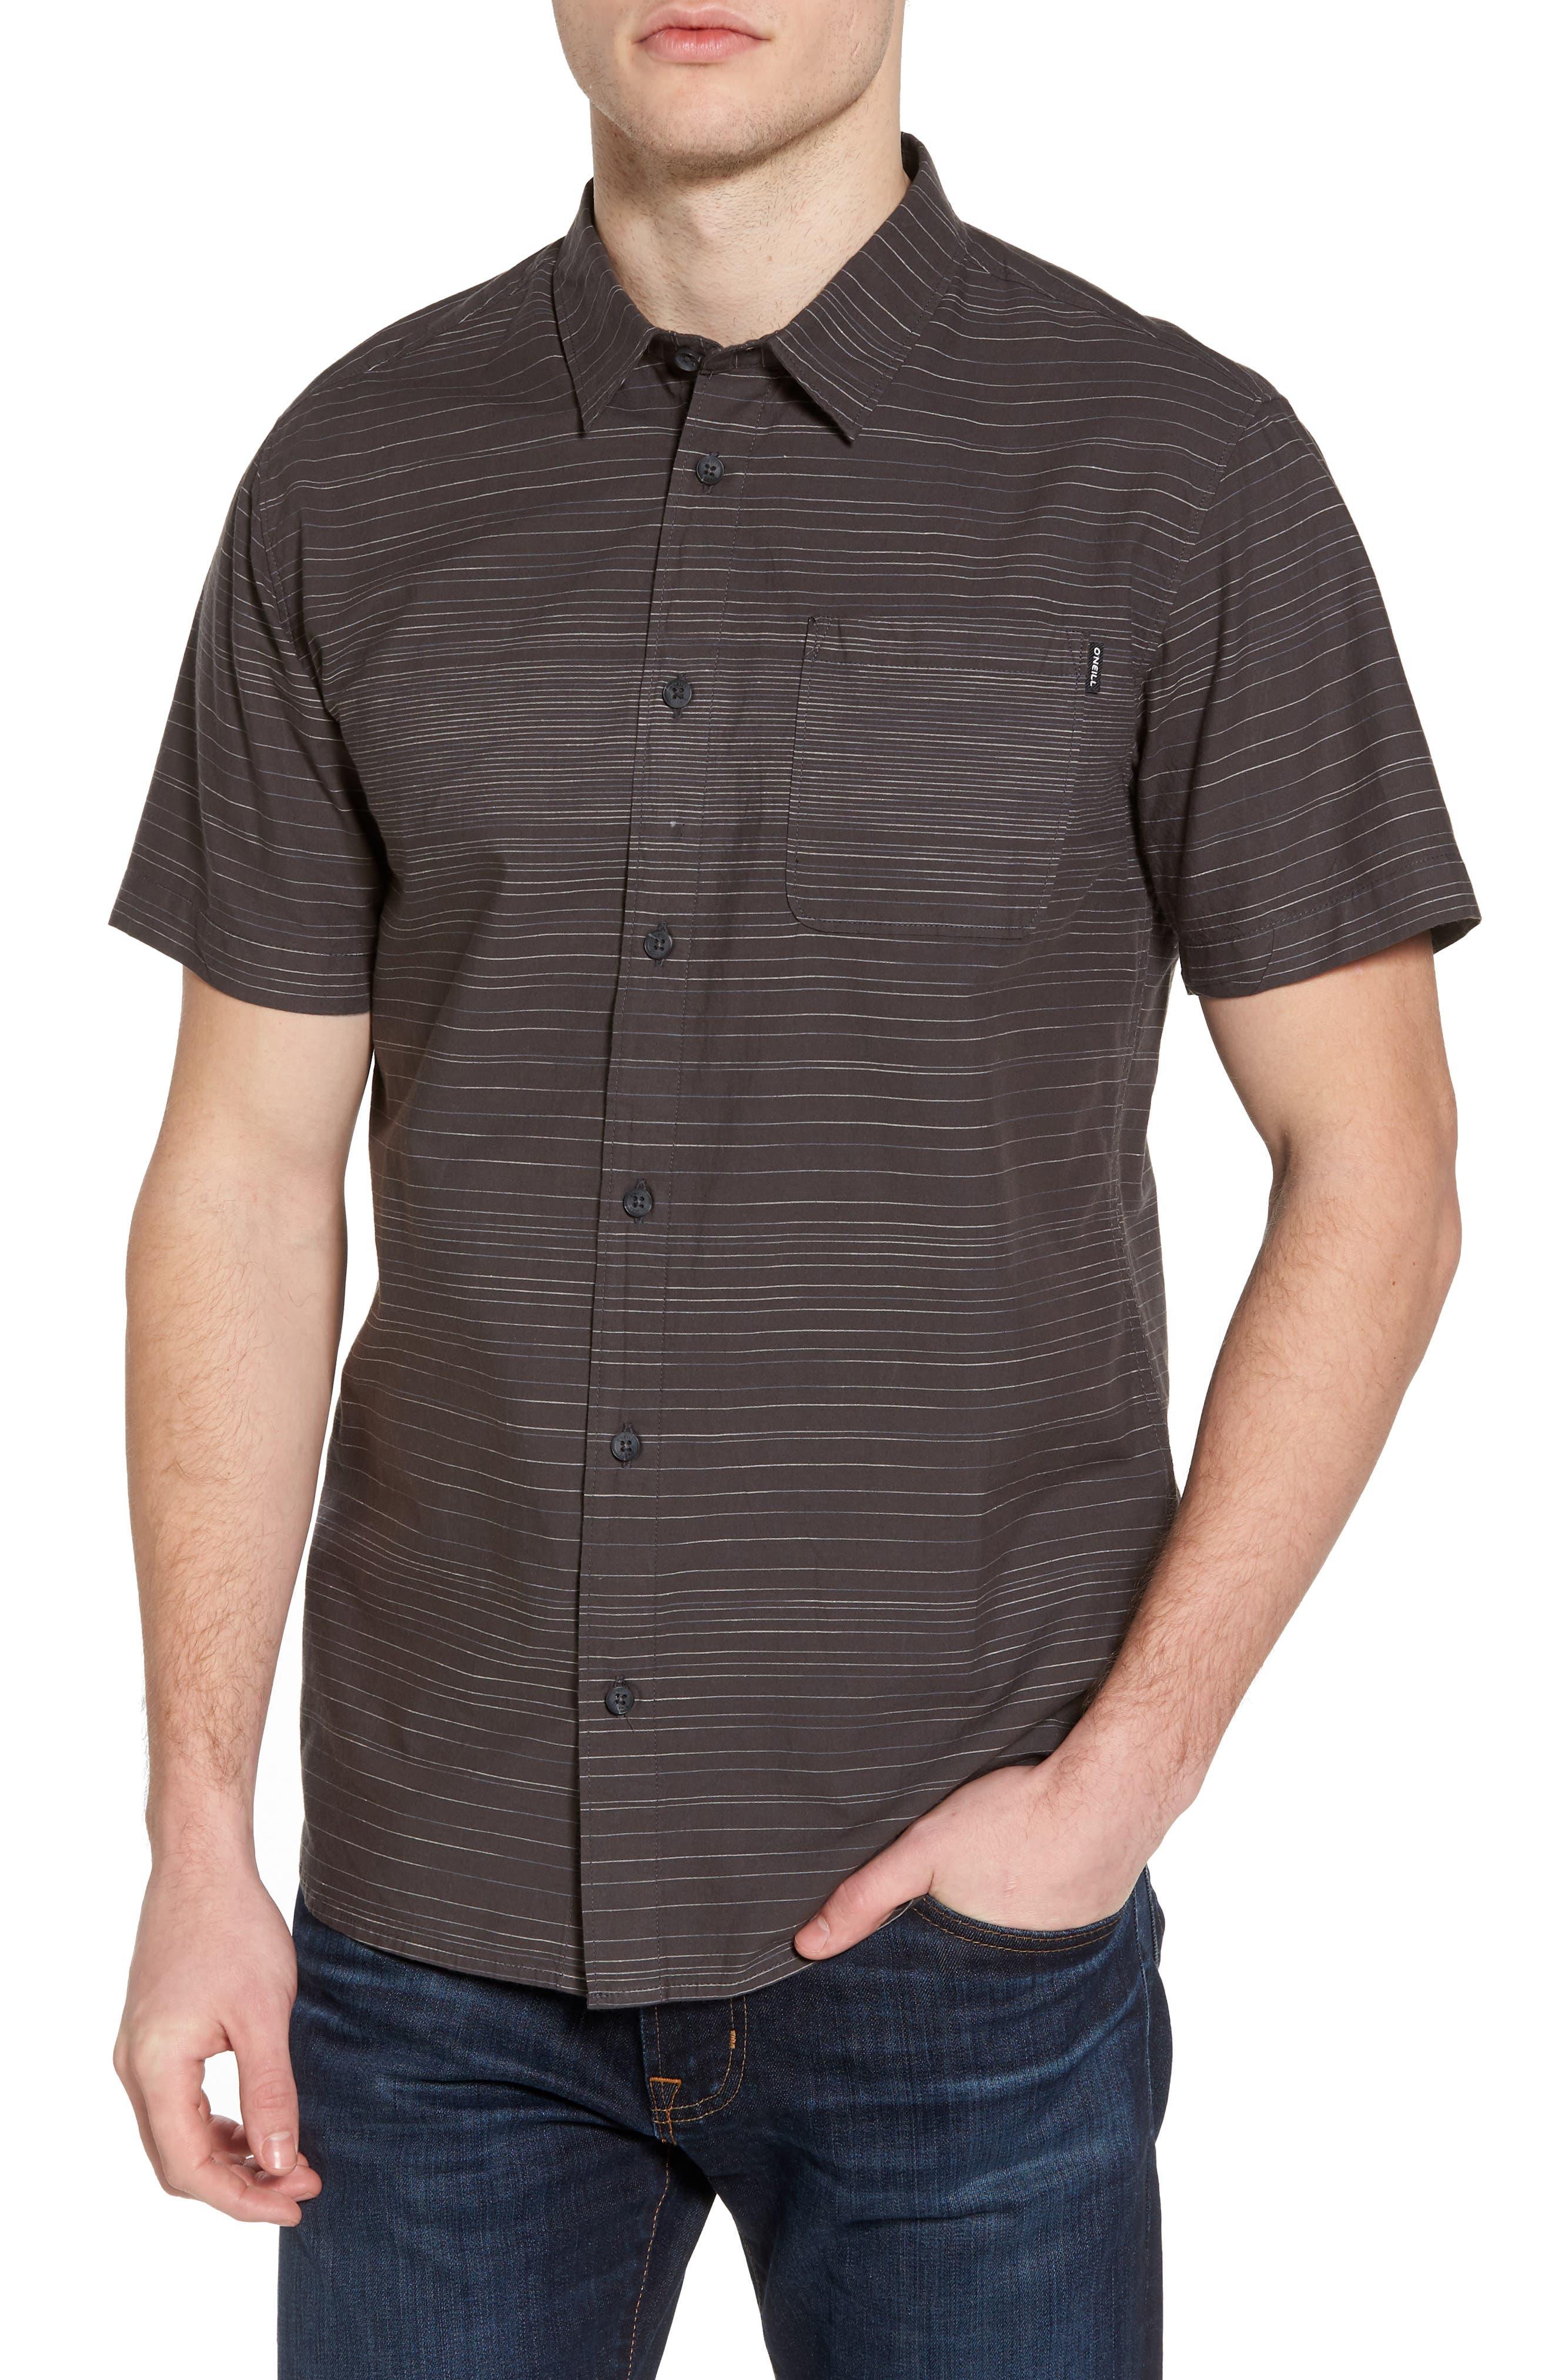 Hound Woven Shirt,                         Main,                         color, 020